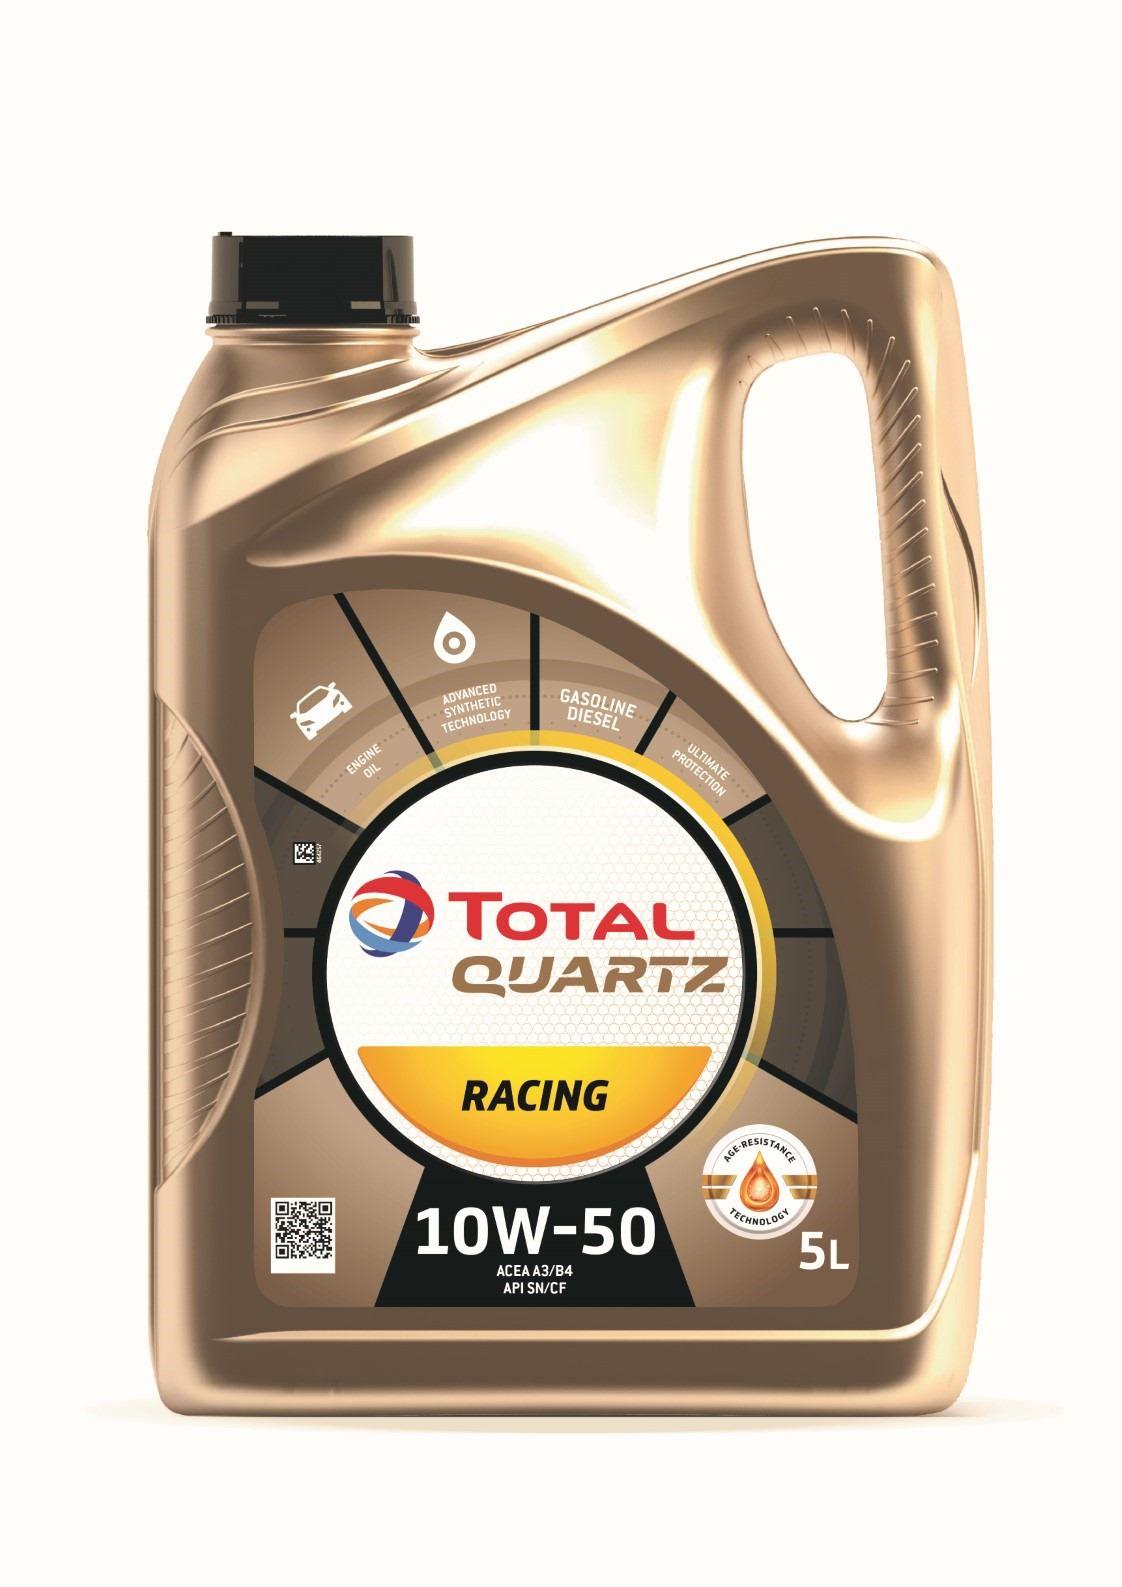 https://commercial.fordfuels.co.uk/wp-content/uploads/sites/10/Total-Quartz-Racing-10w-50-318x450.jpg+https://commercial.fordfuels.co.uk/wp-content/uploads/sites/10/Total-Quartz-Racing-10w-50-636x900.jpg